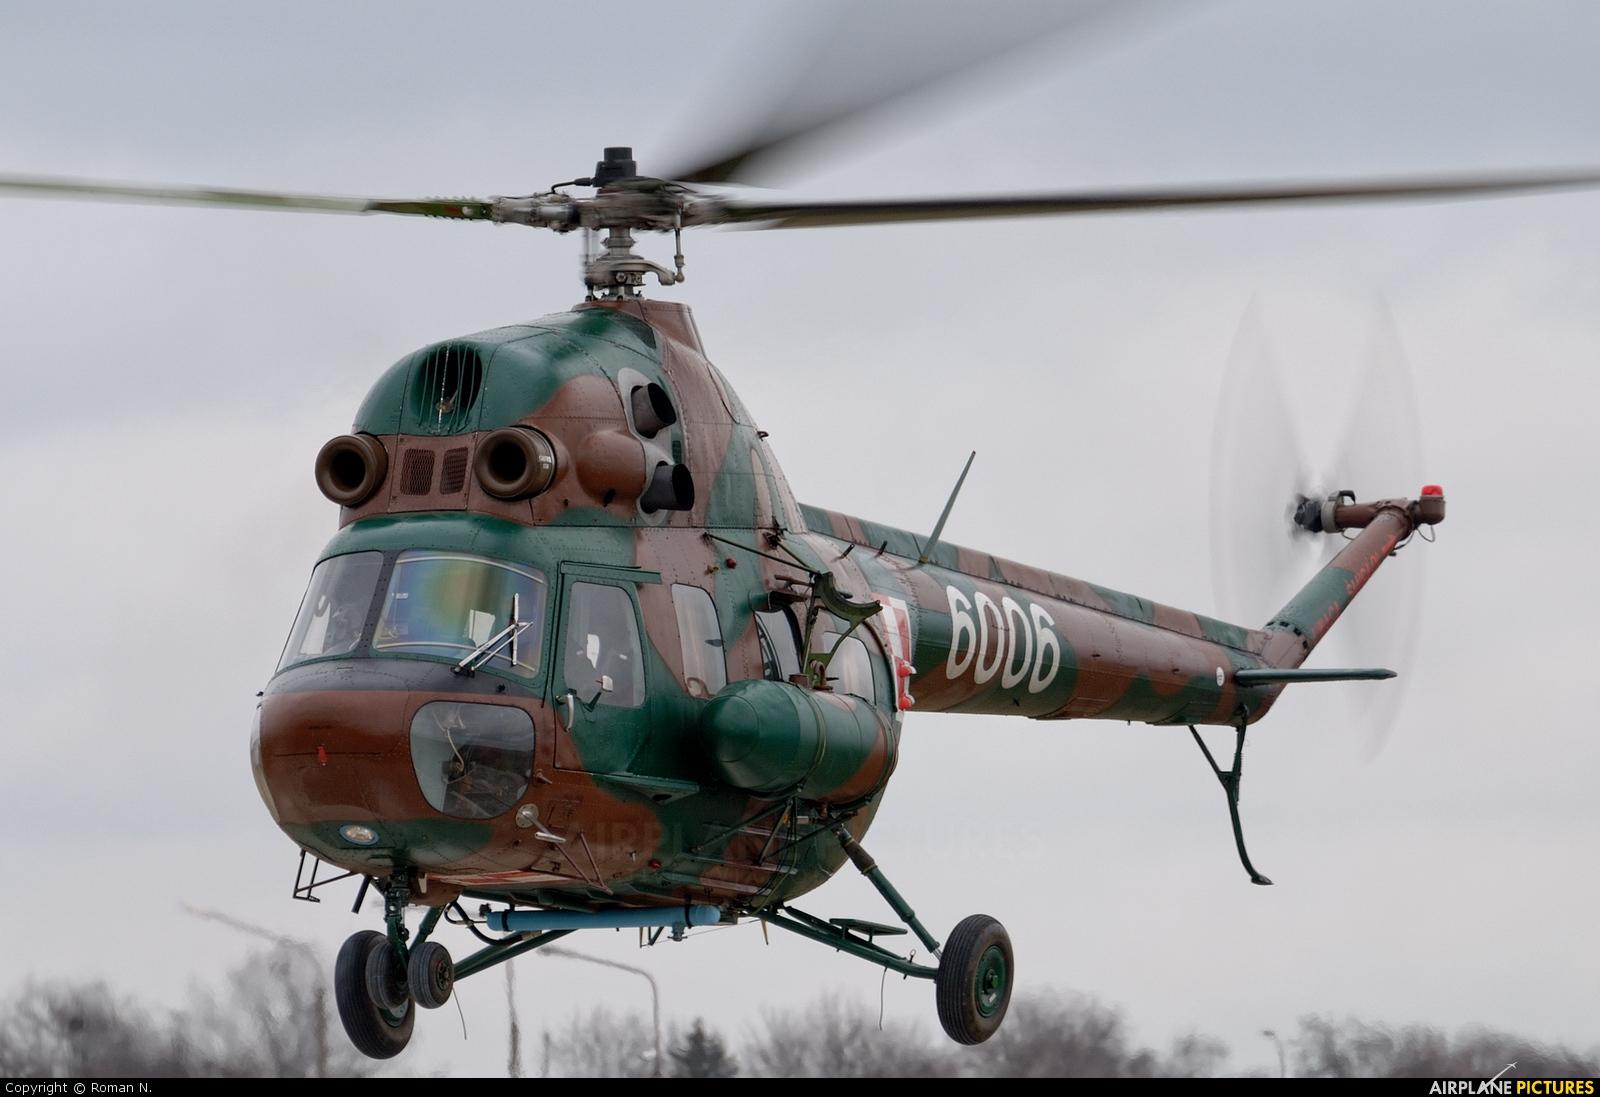 Poland - Air Force 6006 aircraft at Bydgoszcz - Szwederowo